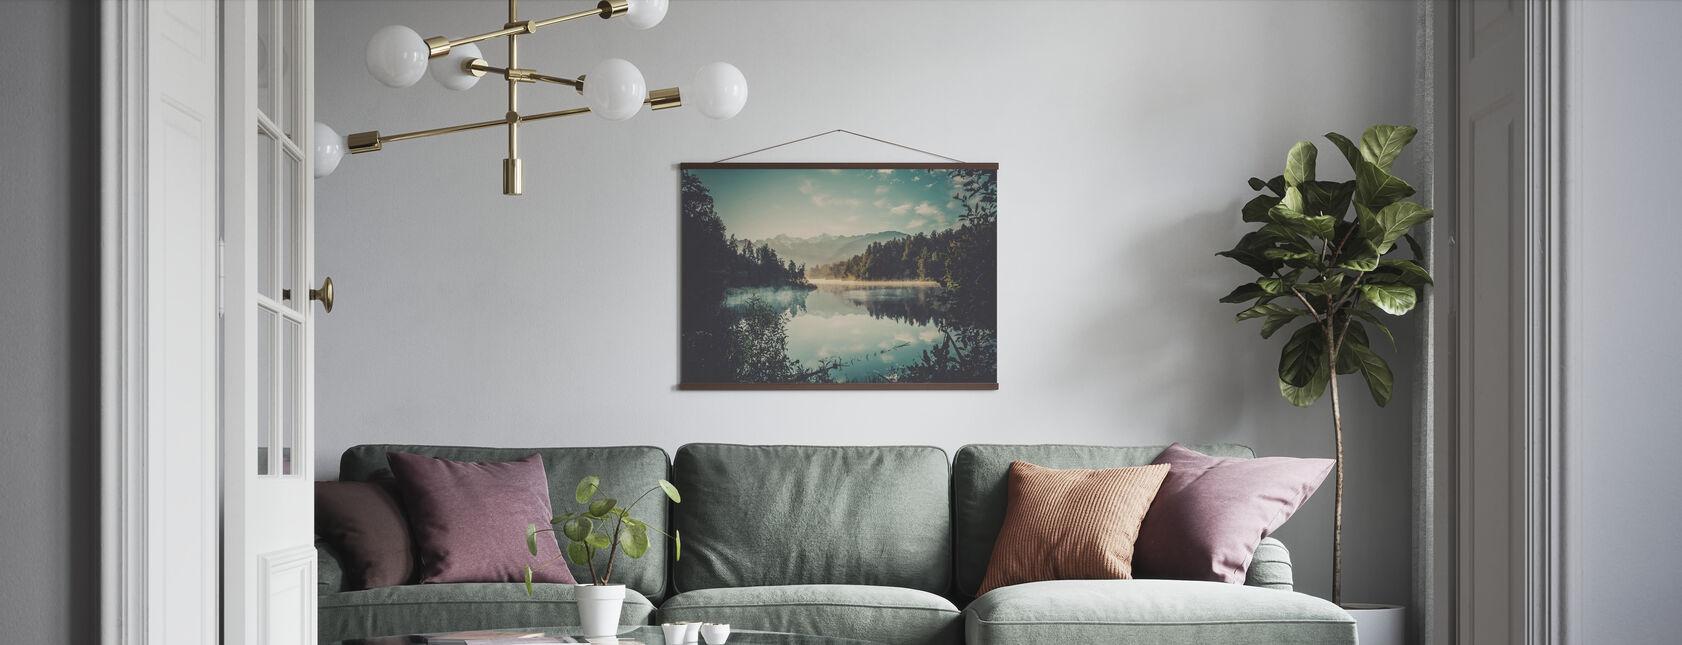 Reis Herinneringen - Poster - Woonkamer